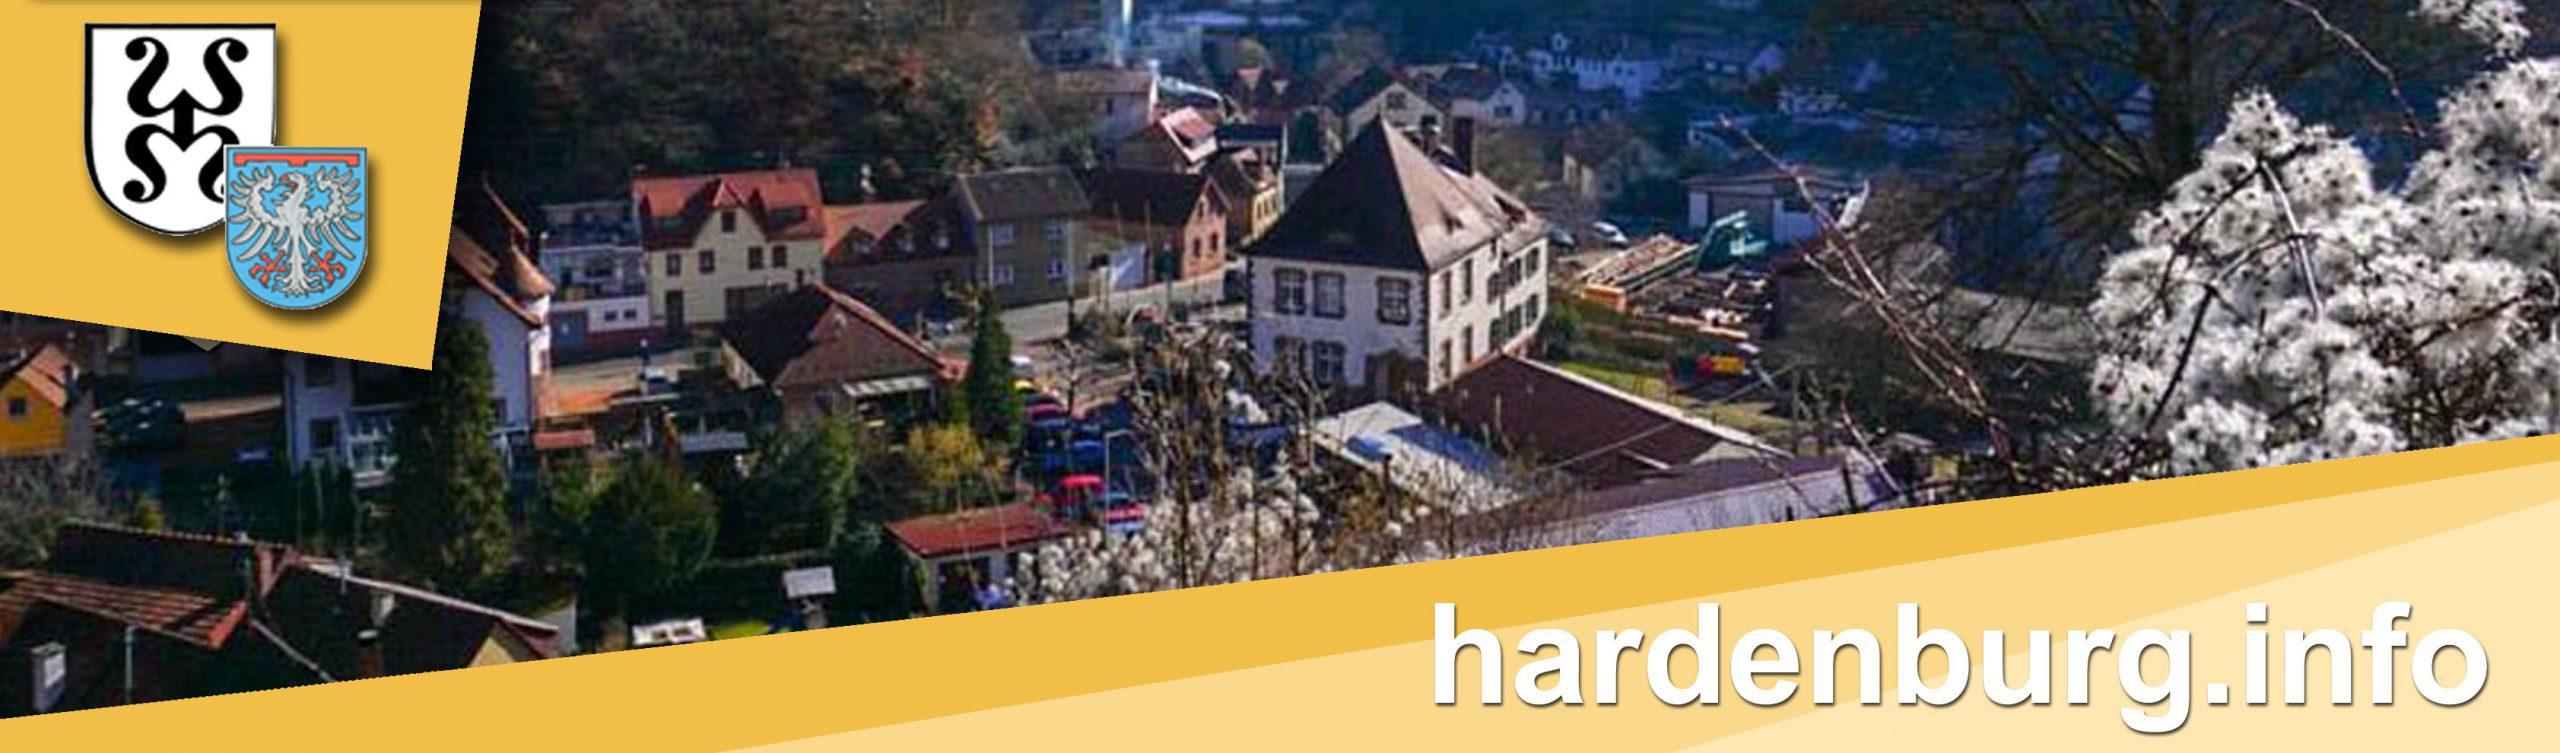 HARDENBURG.INFO